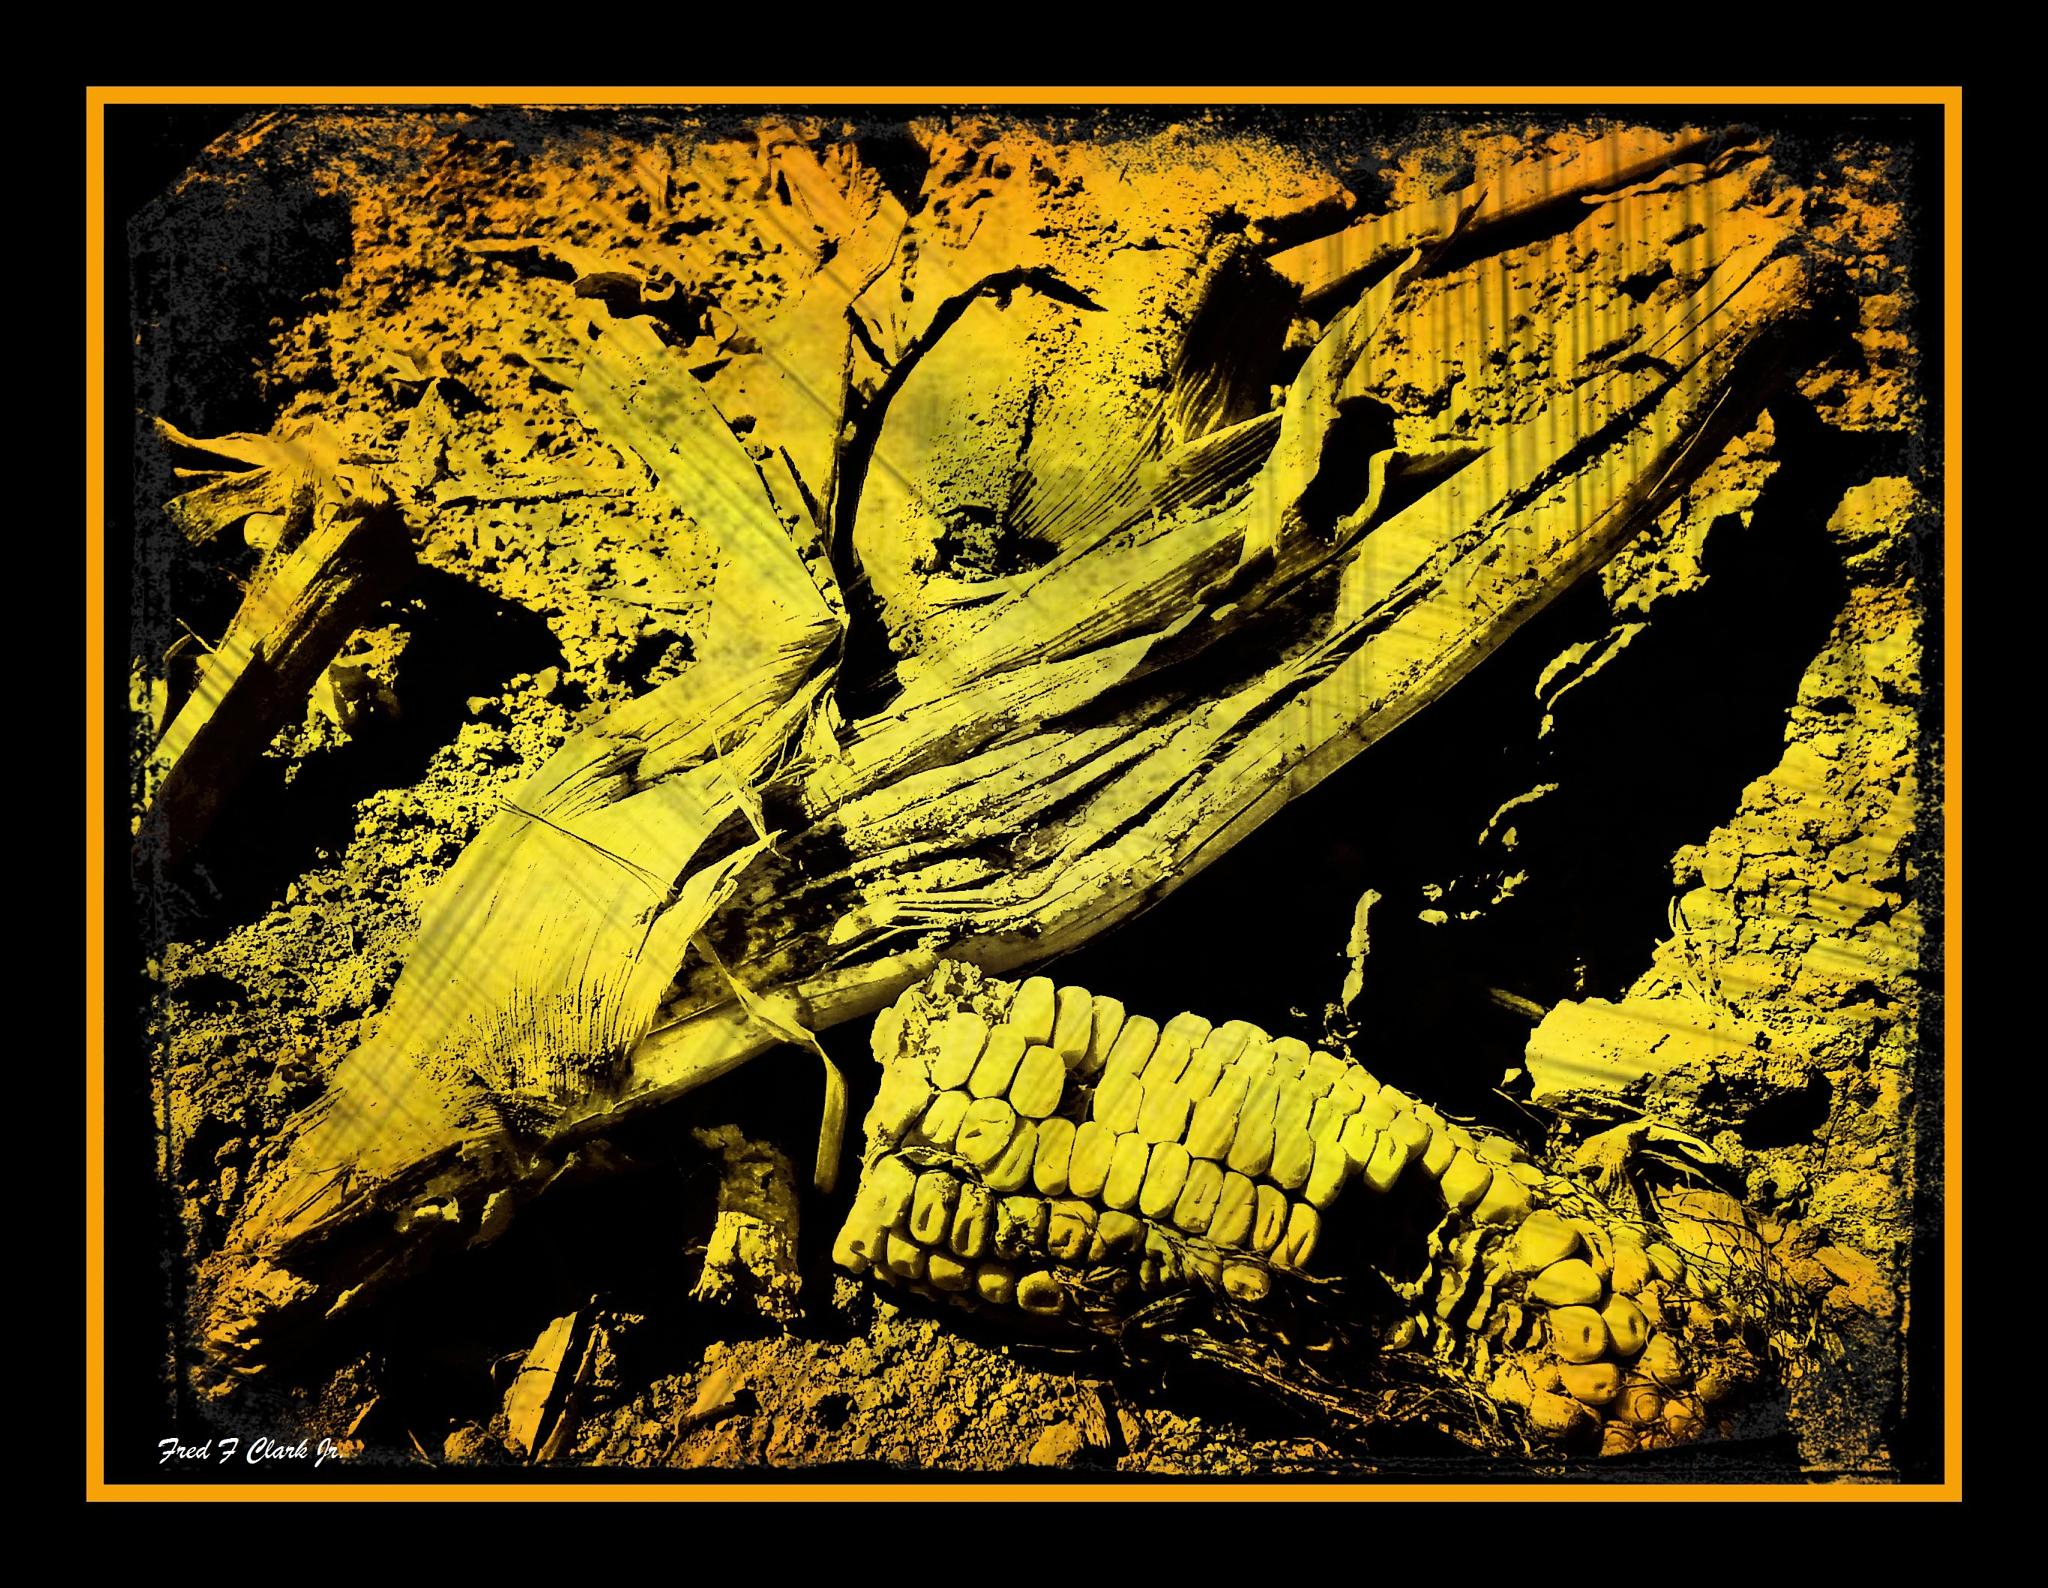 Corn by fred.clark.359